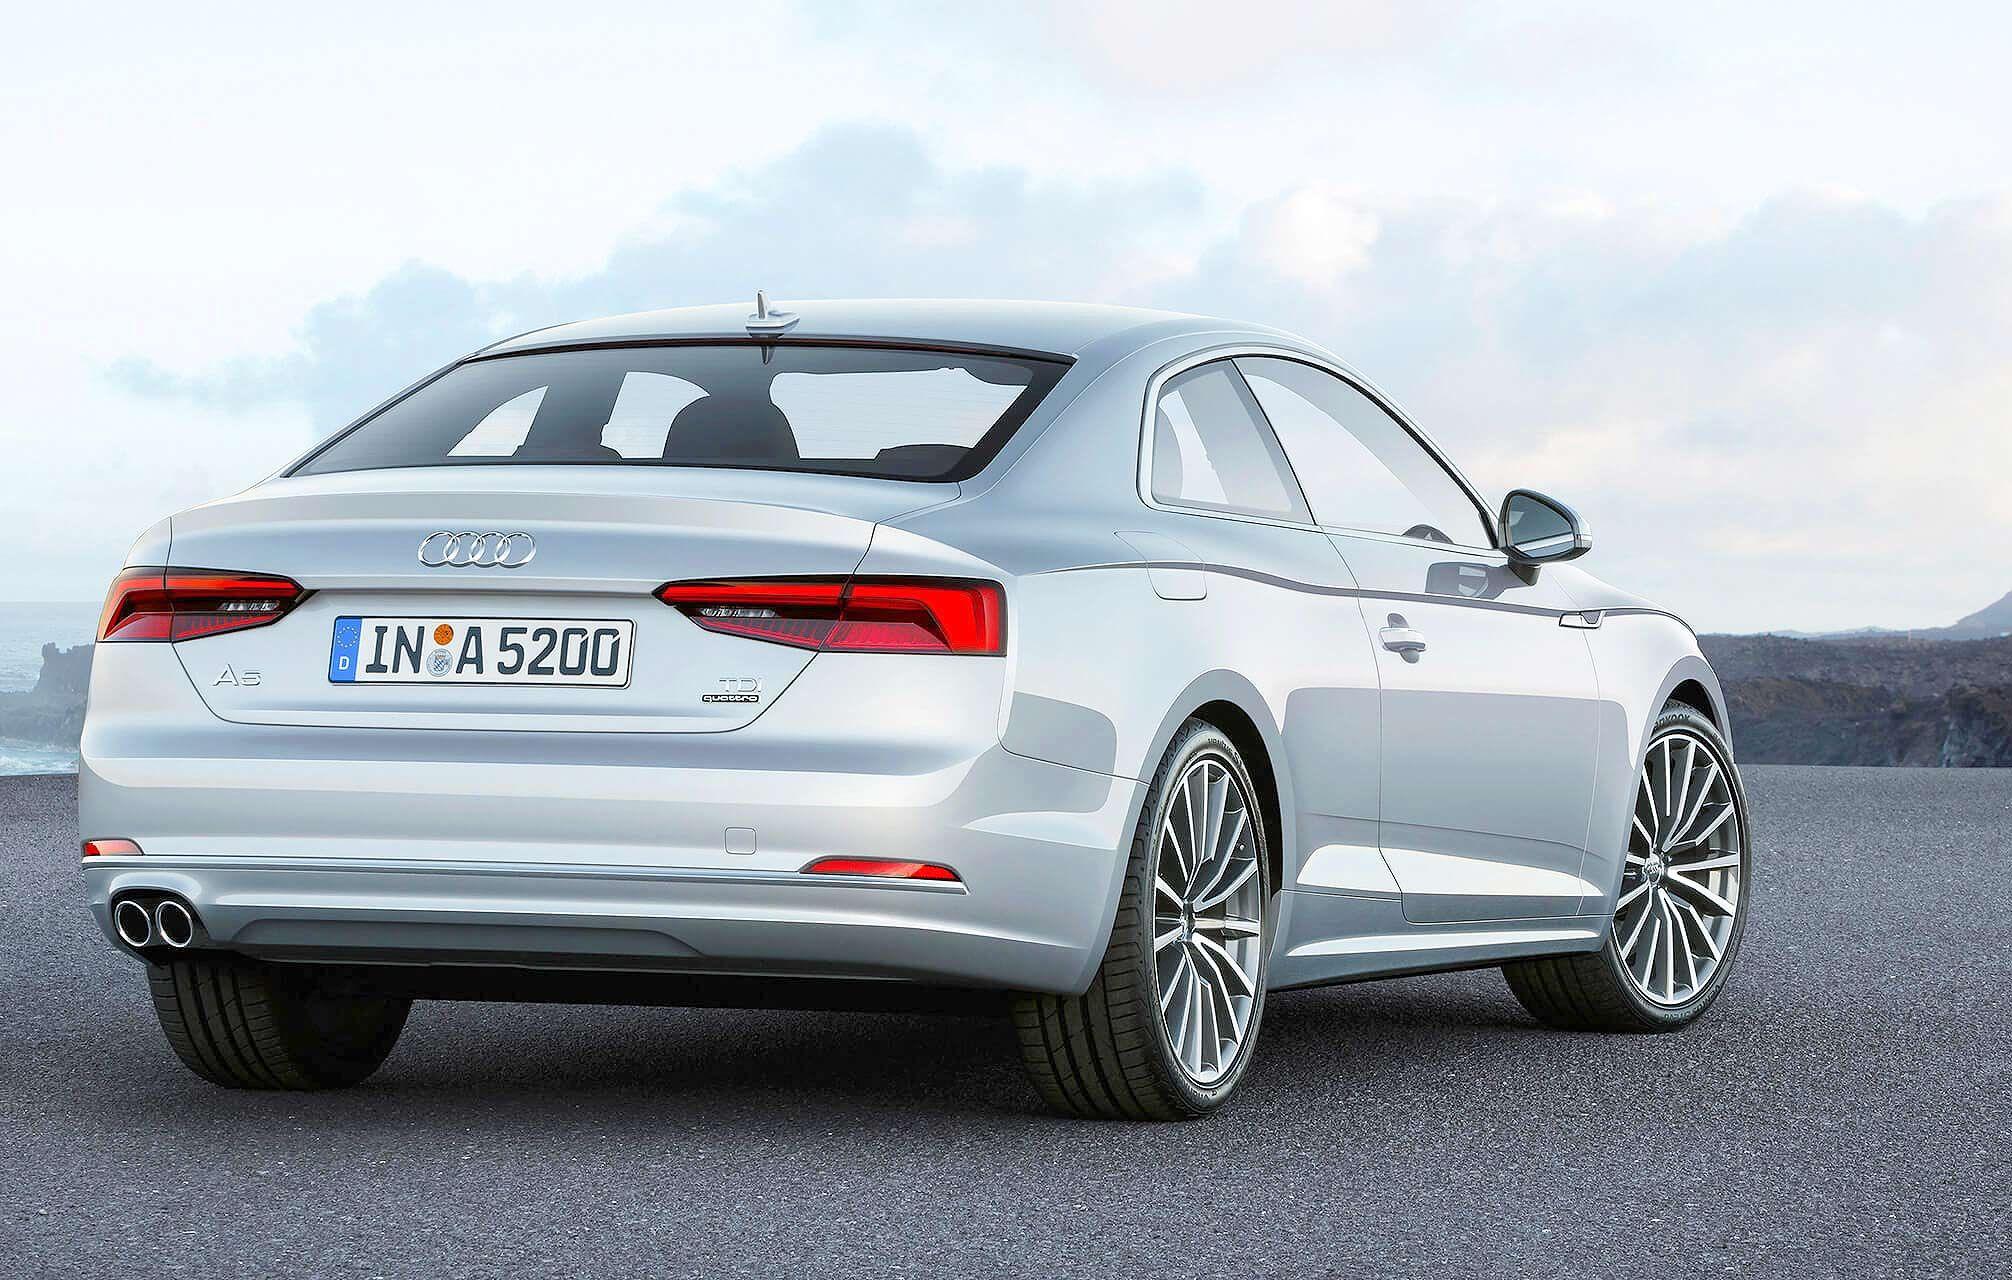 Kekurangan Audi A6 Coupe Spesifikasi